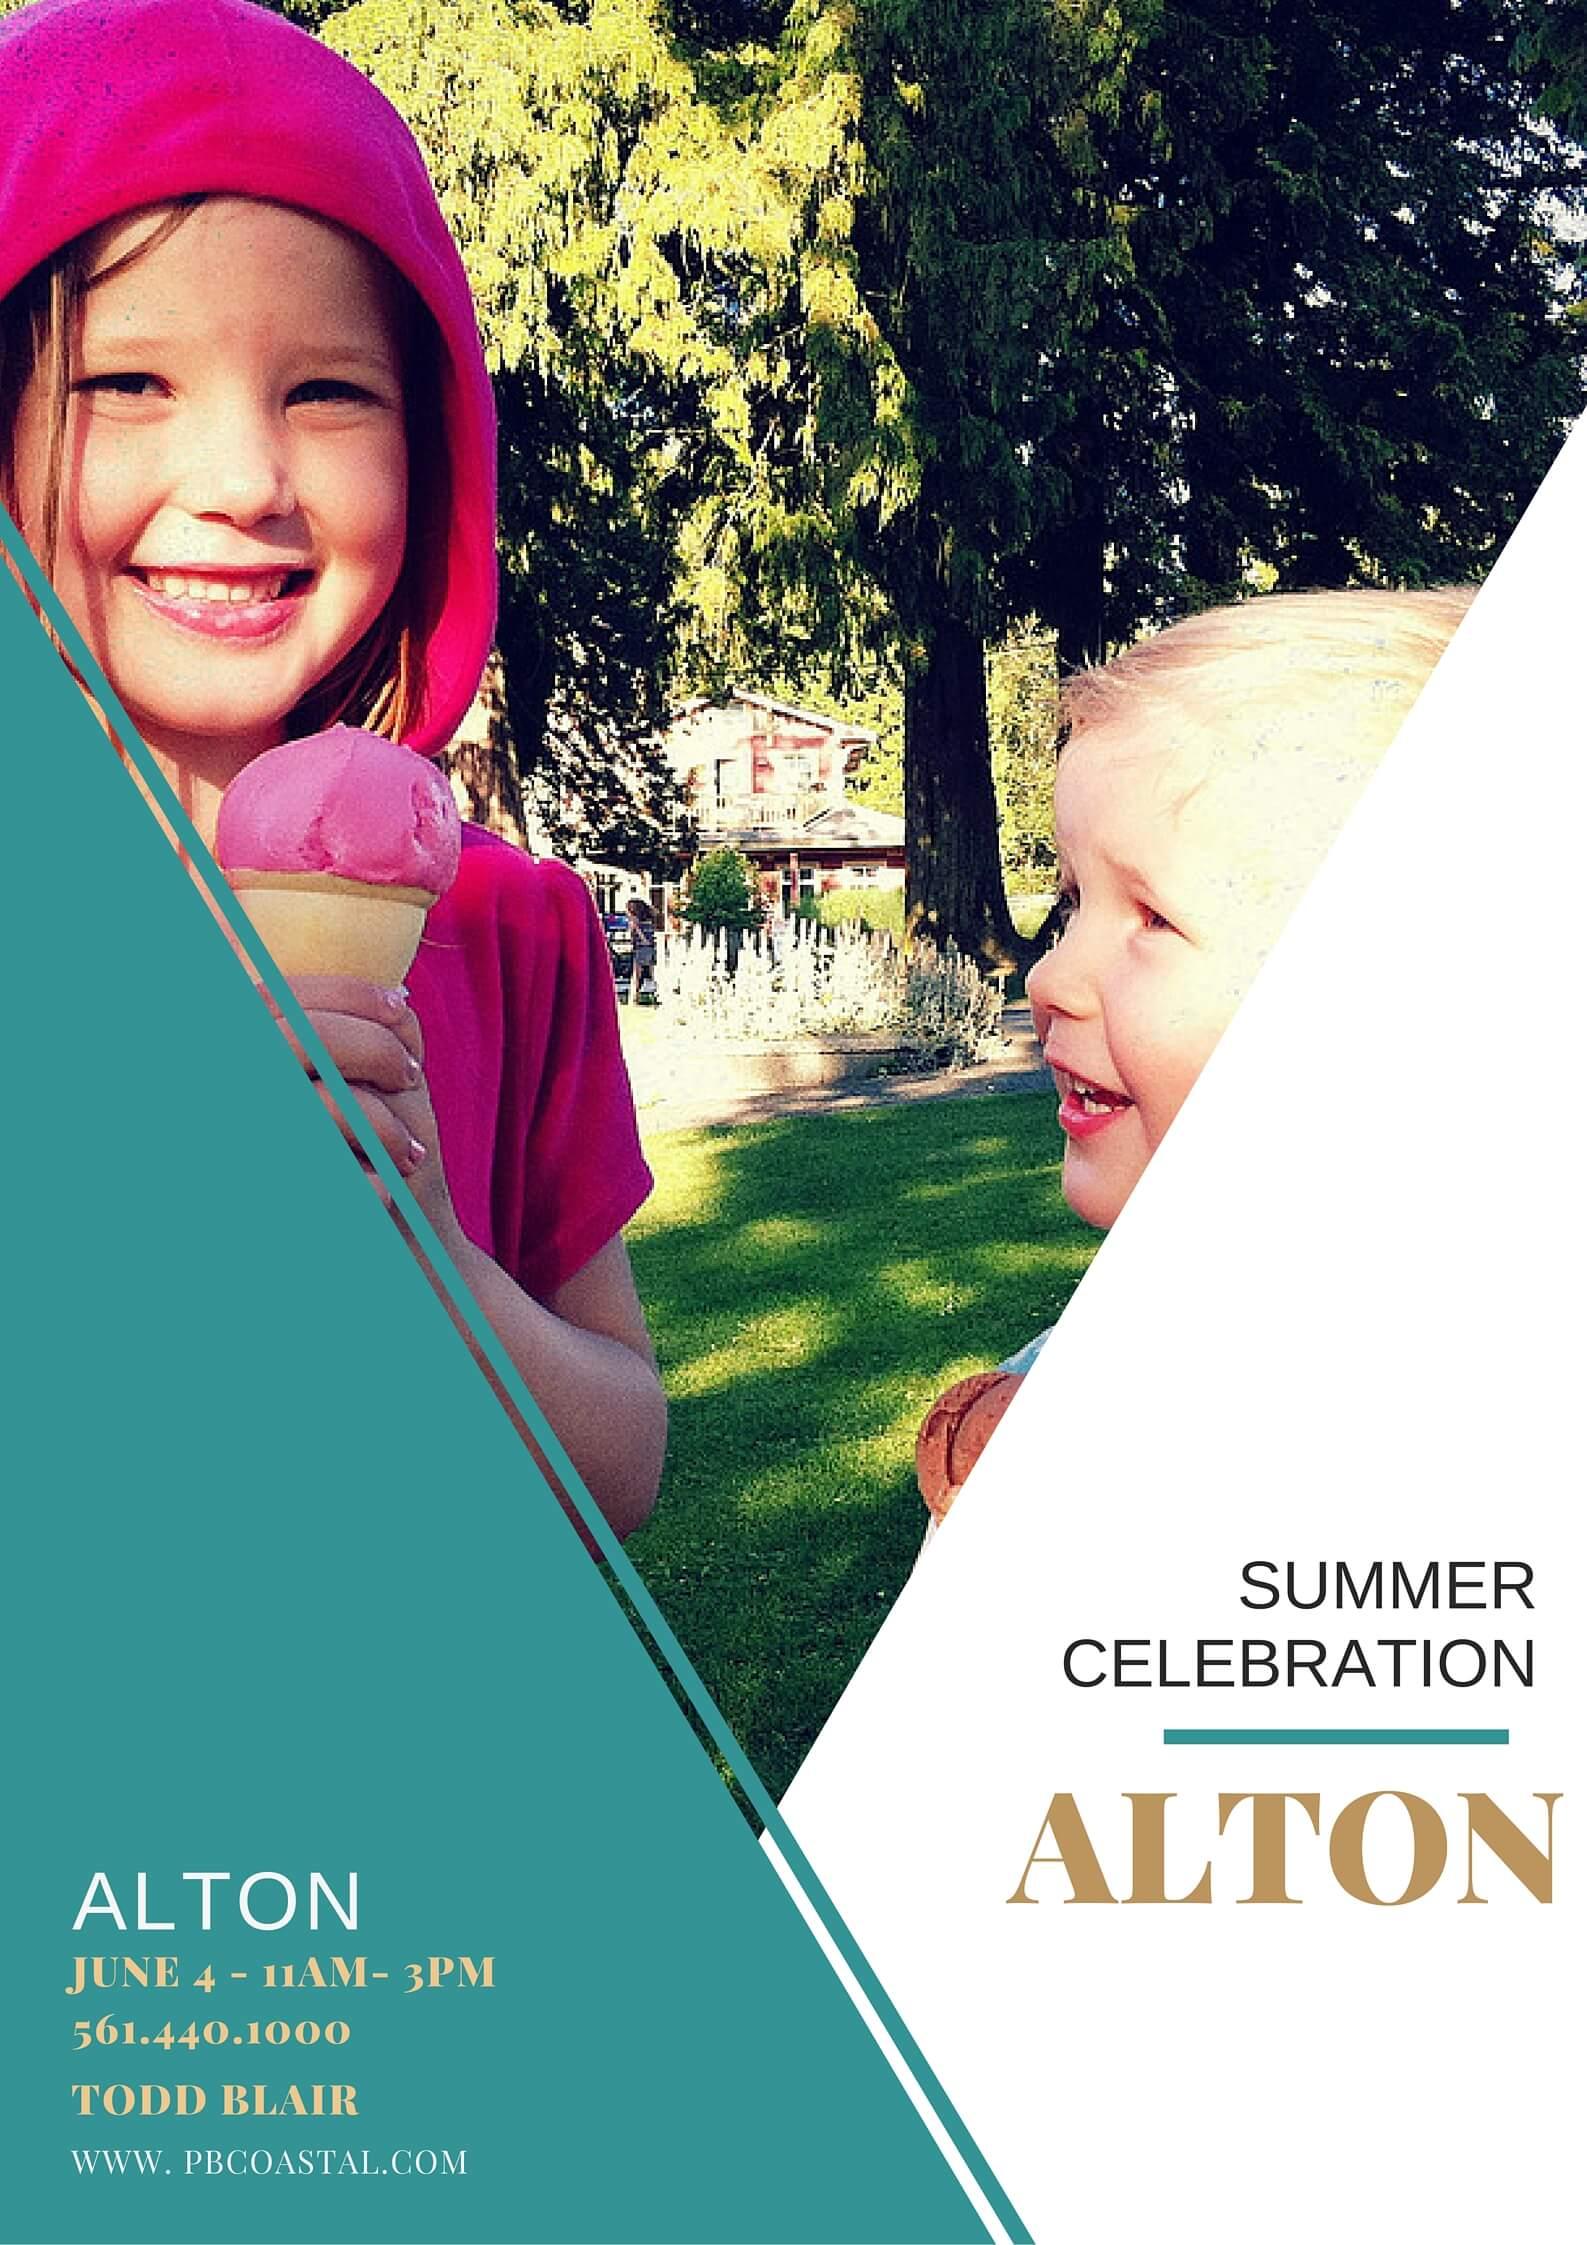 Alton Summer Celebration